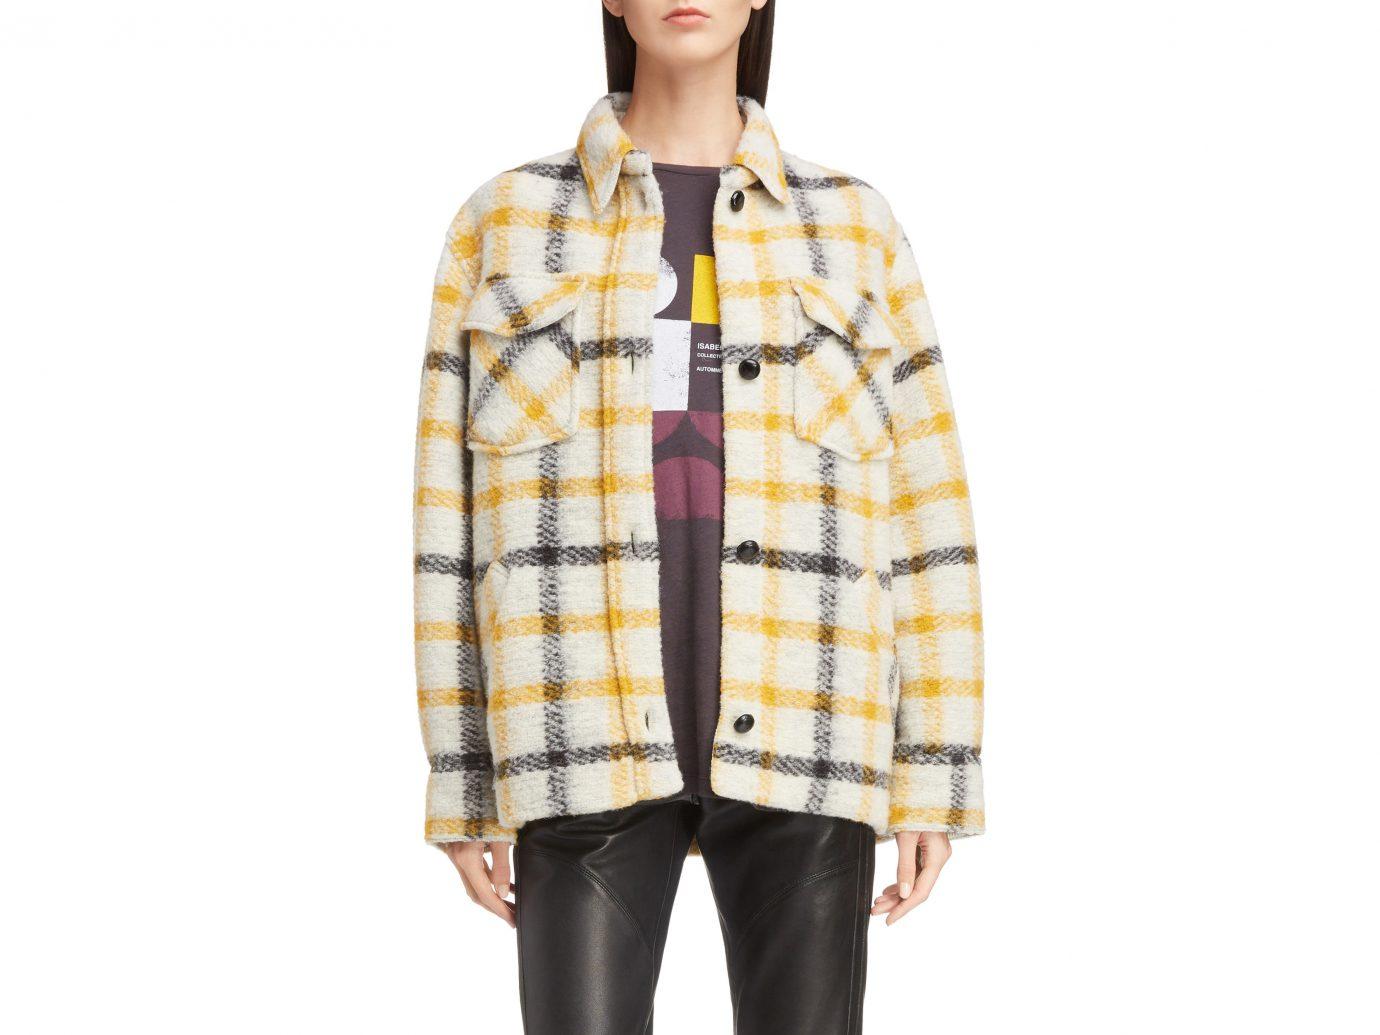 Isabel Marant Étoile Gast Check Wool Blend Jacket, Main, color, Ecru/ Yellow Isabel Marant Étoile Gast Check Wool Blend Jacket